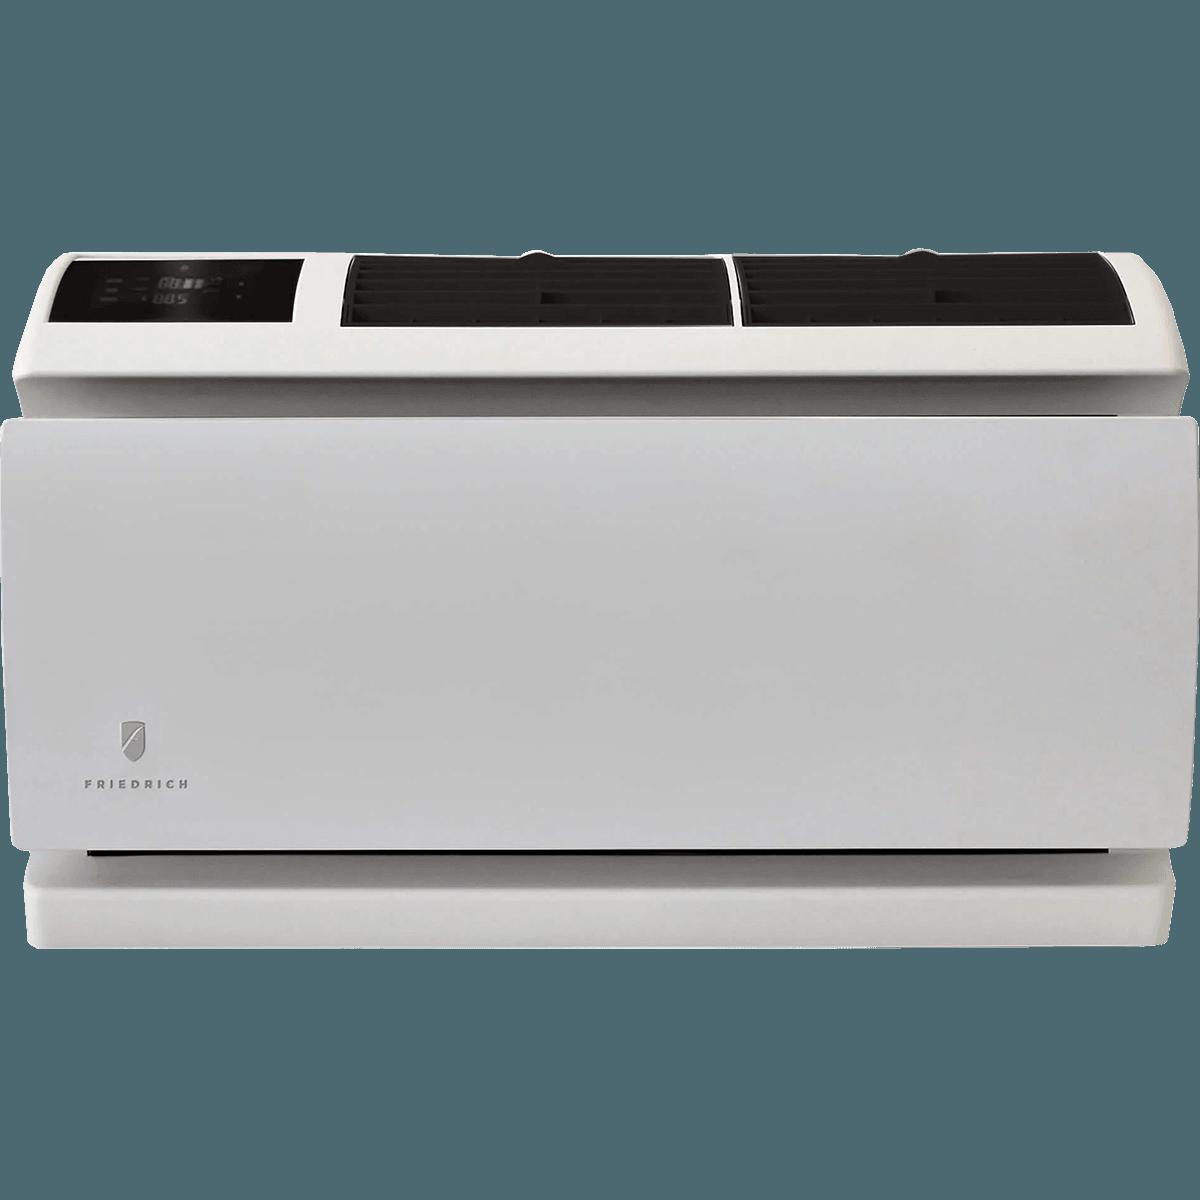 Buy Cheap Friedrich Wallmaster 15500 Btu Thru The Wall Ac With Electric Heat Bestairpurifiers Best Air In 2020 Wall Air Conditioner Wall Air Conditioners Cool Rooms